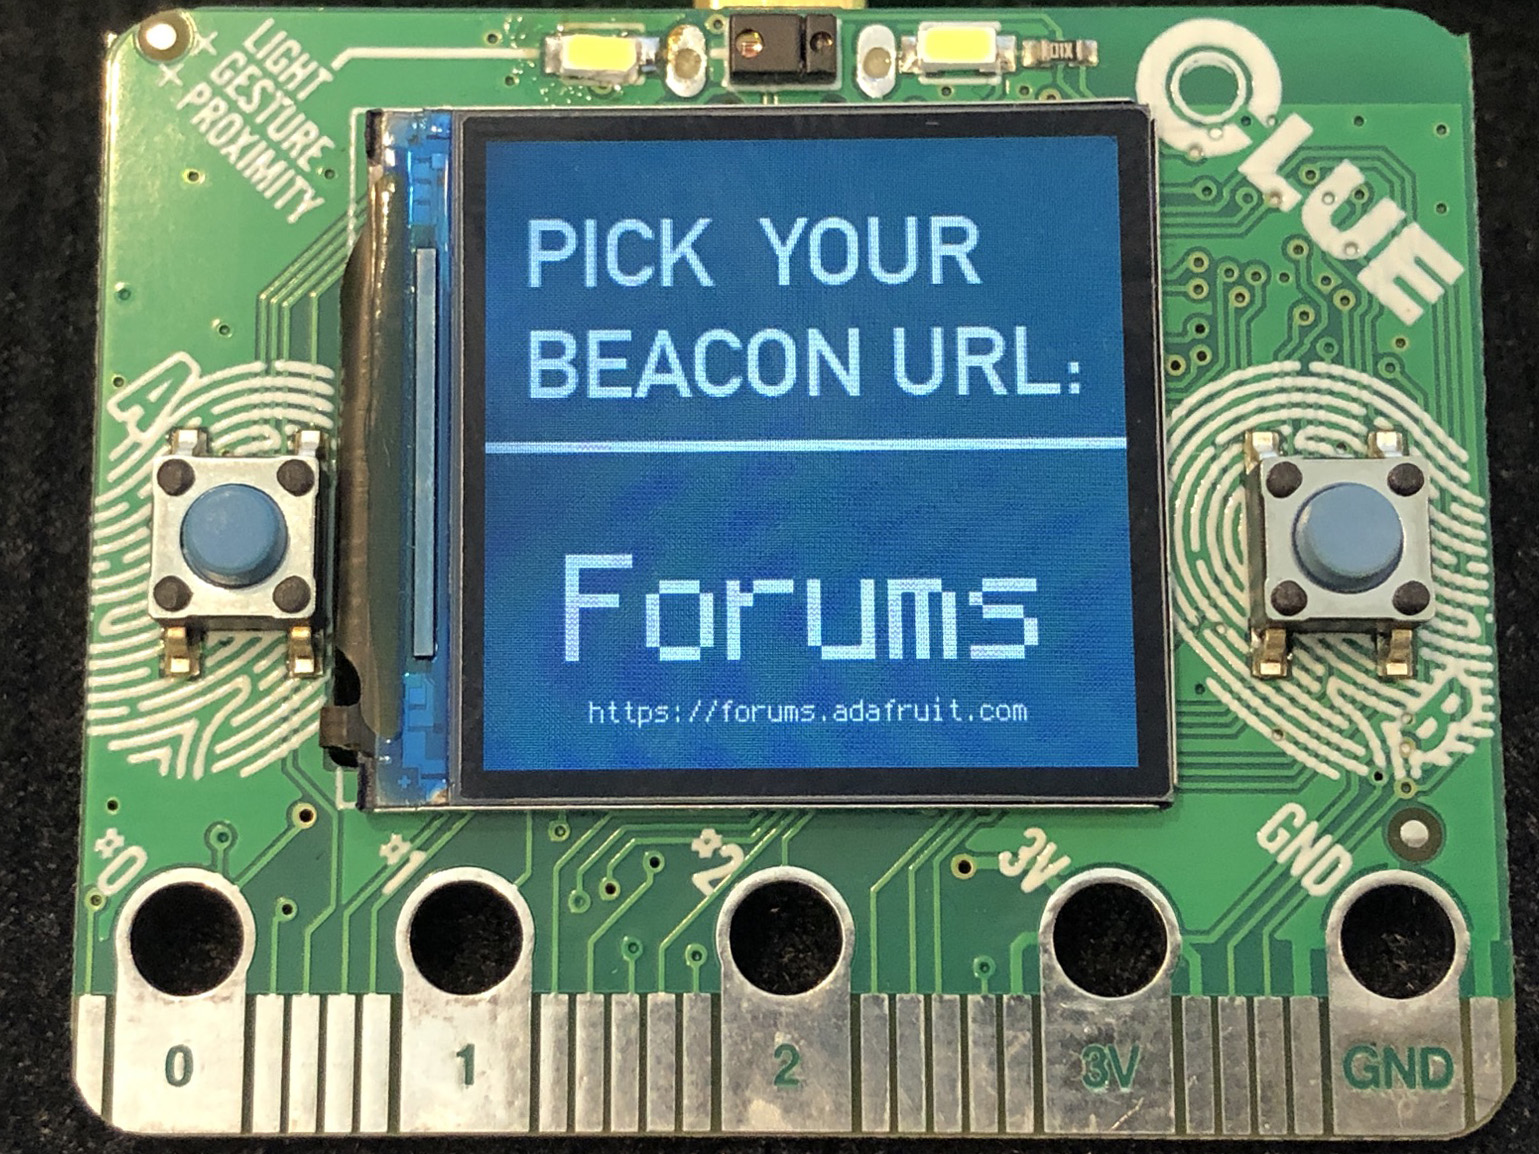 circuitpython_IMG_0959.jpg